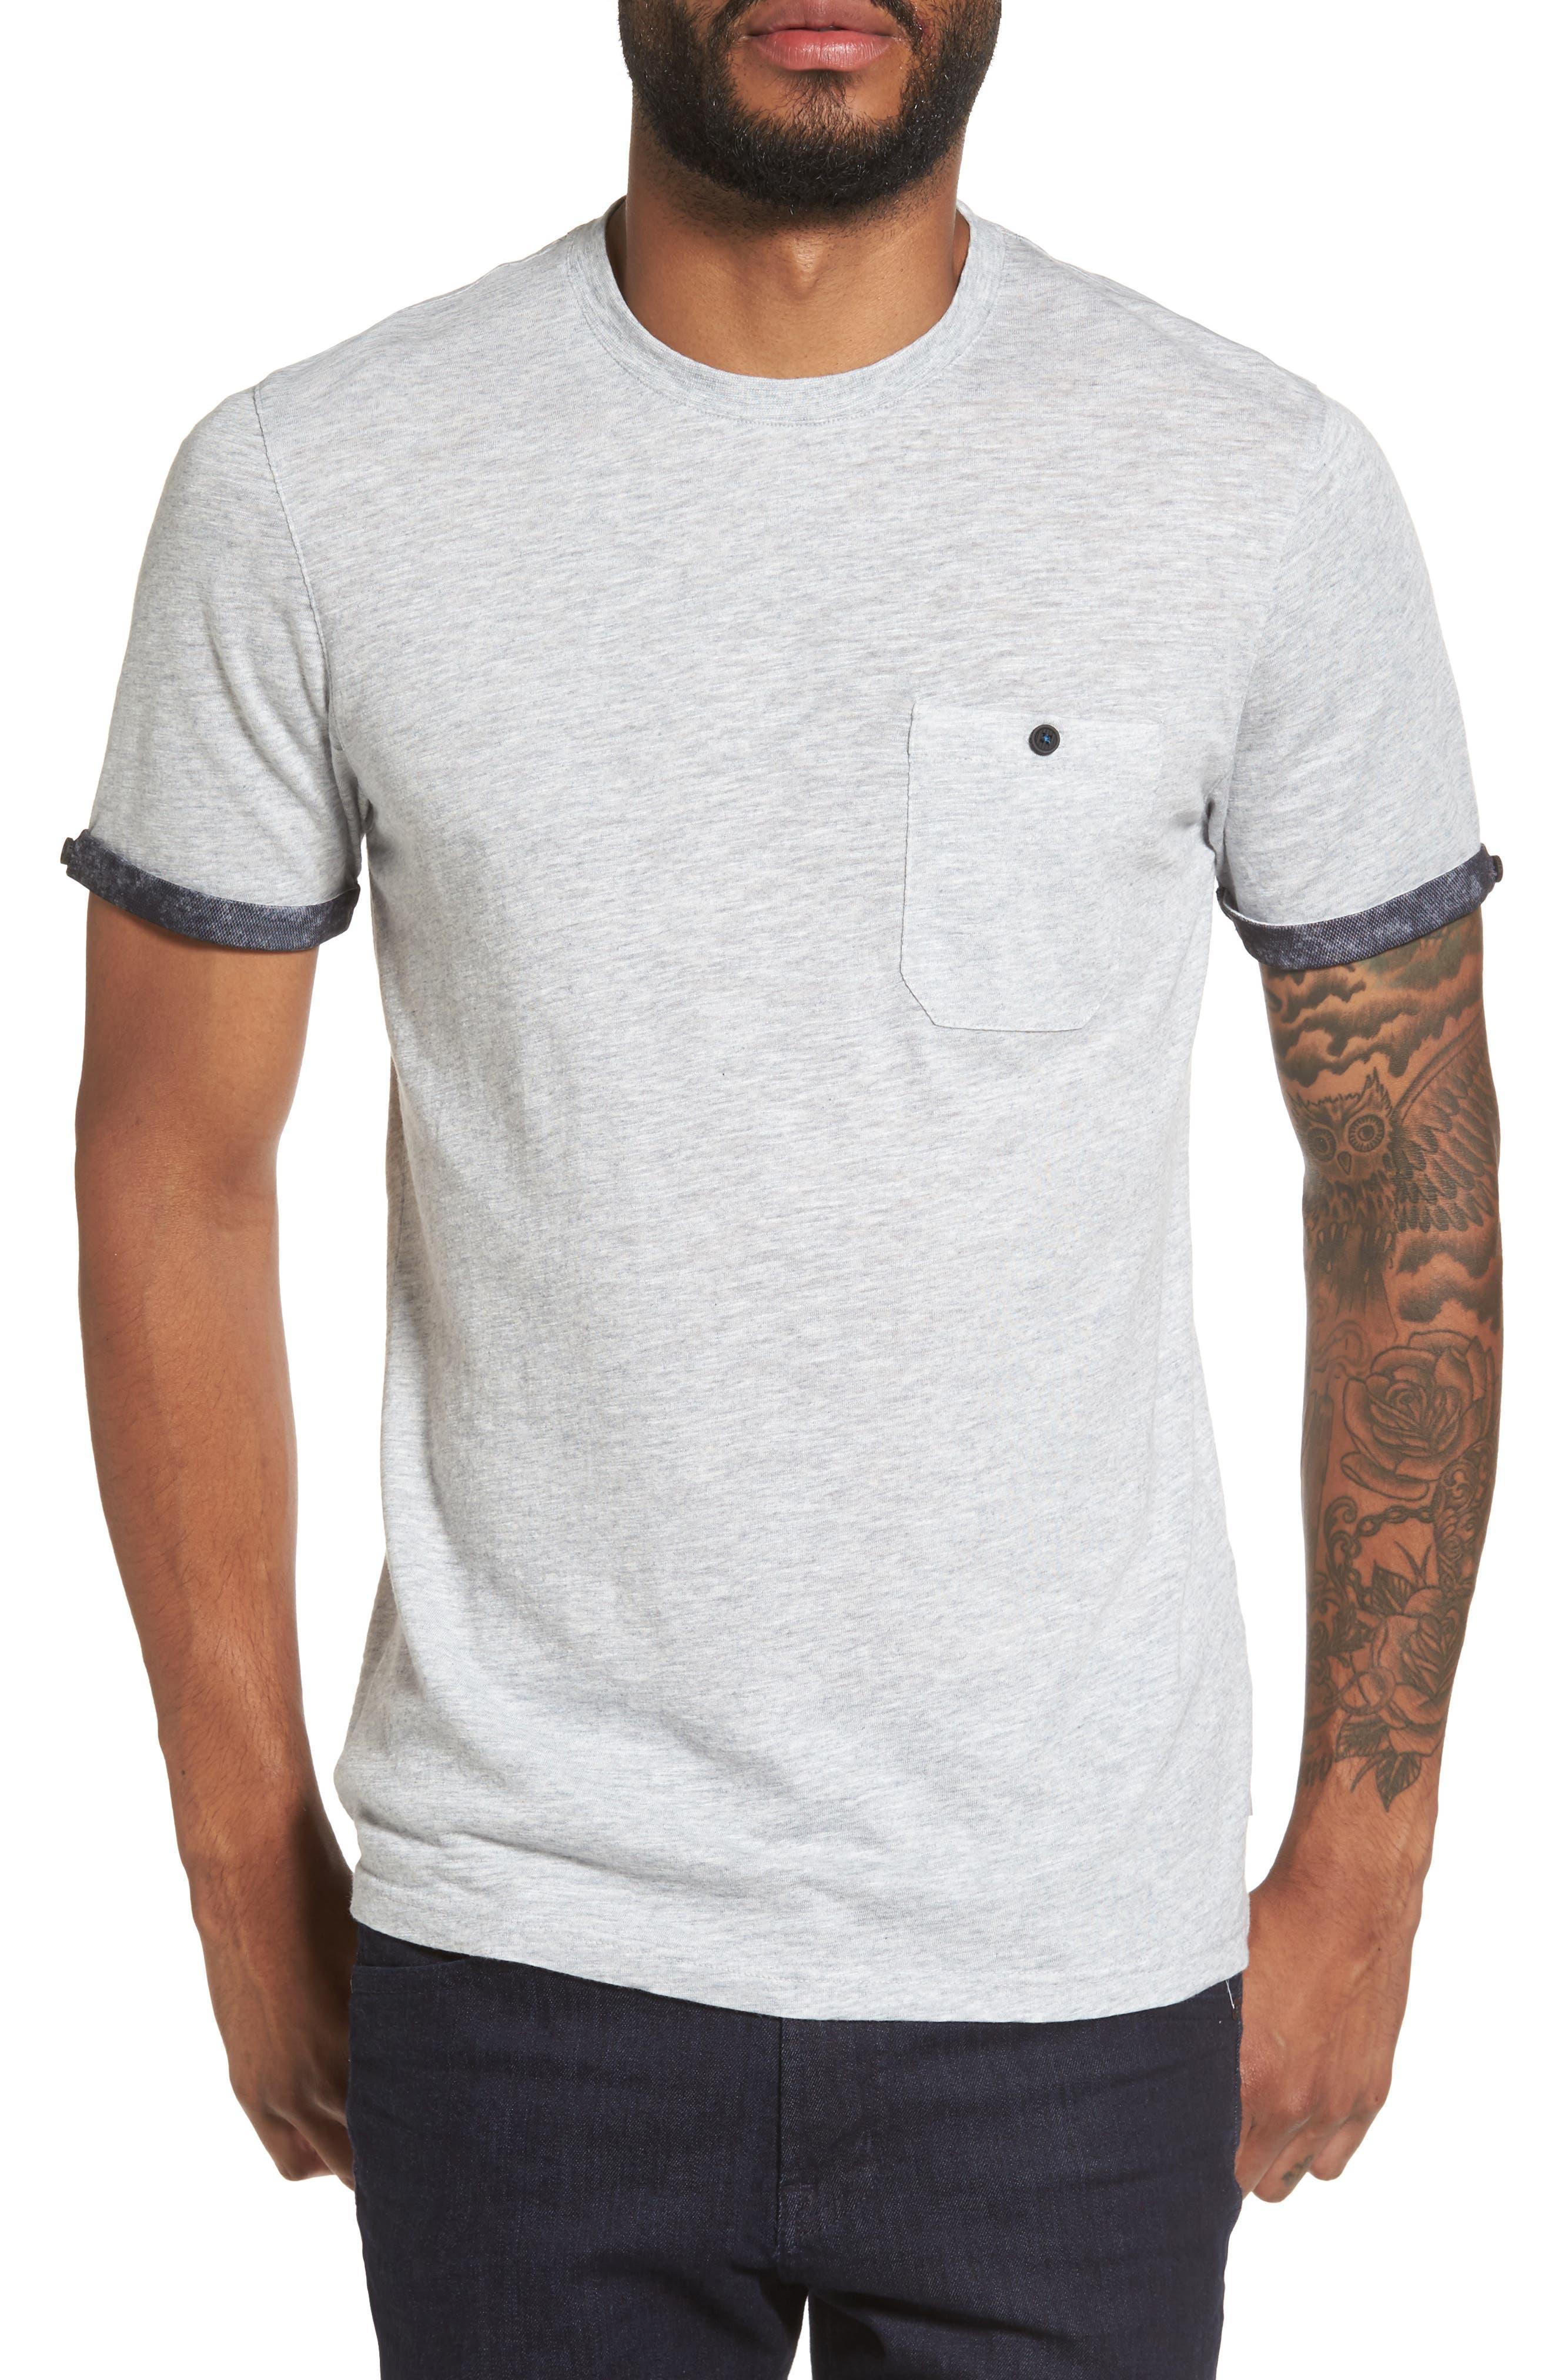 Samsal Pocket T-Shirt,                         Main,                         color, Grey Marl